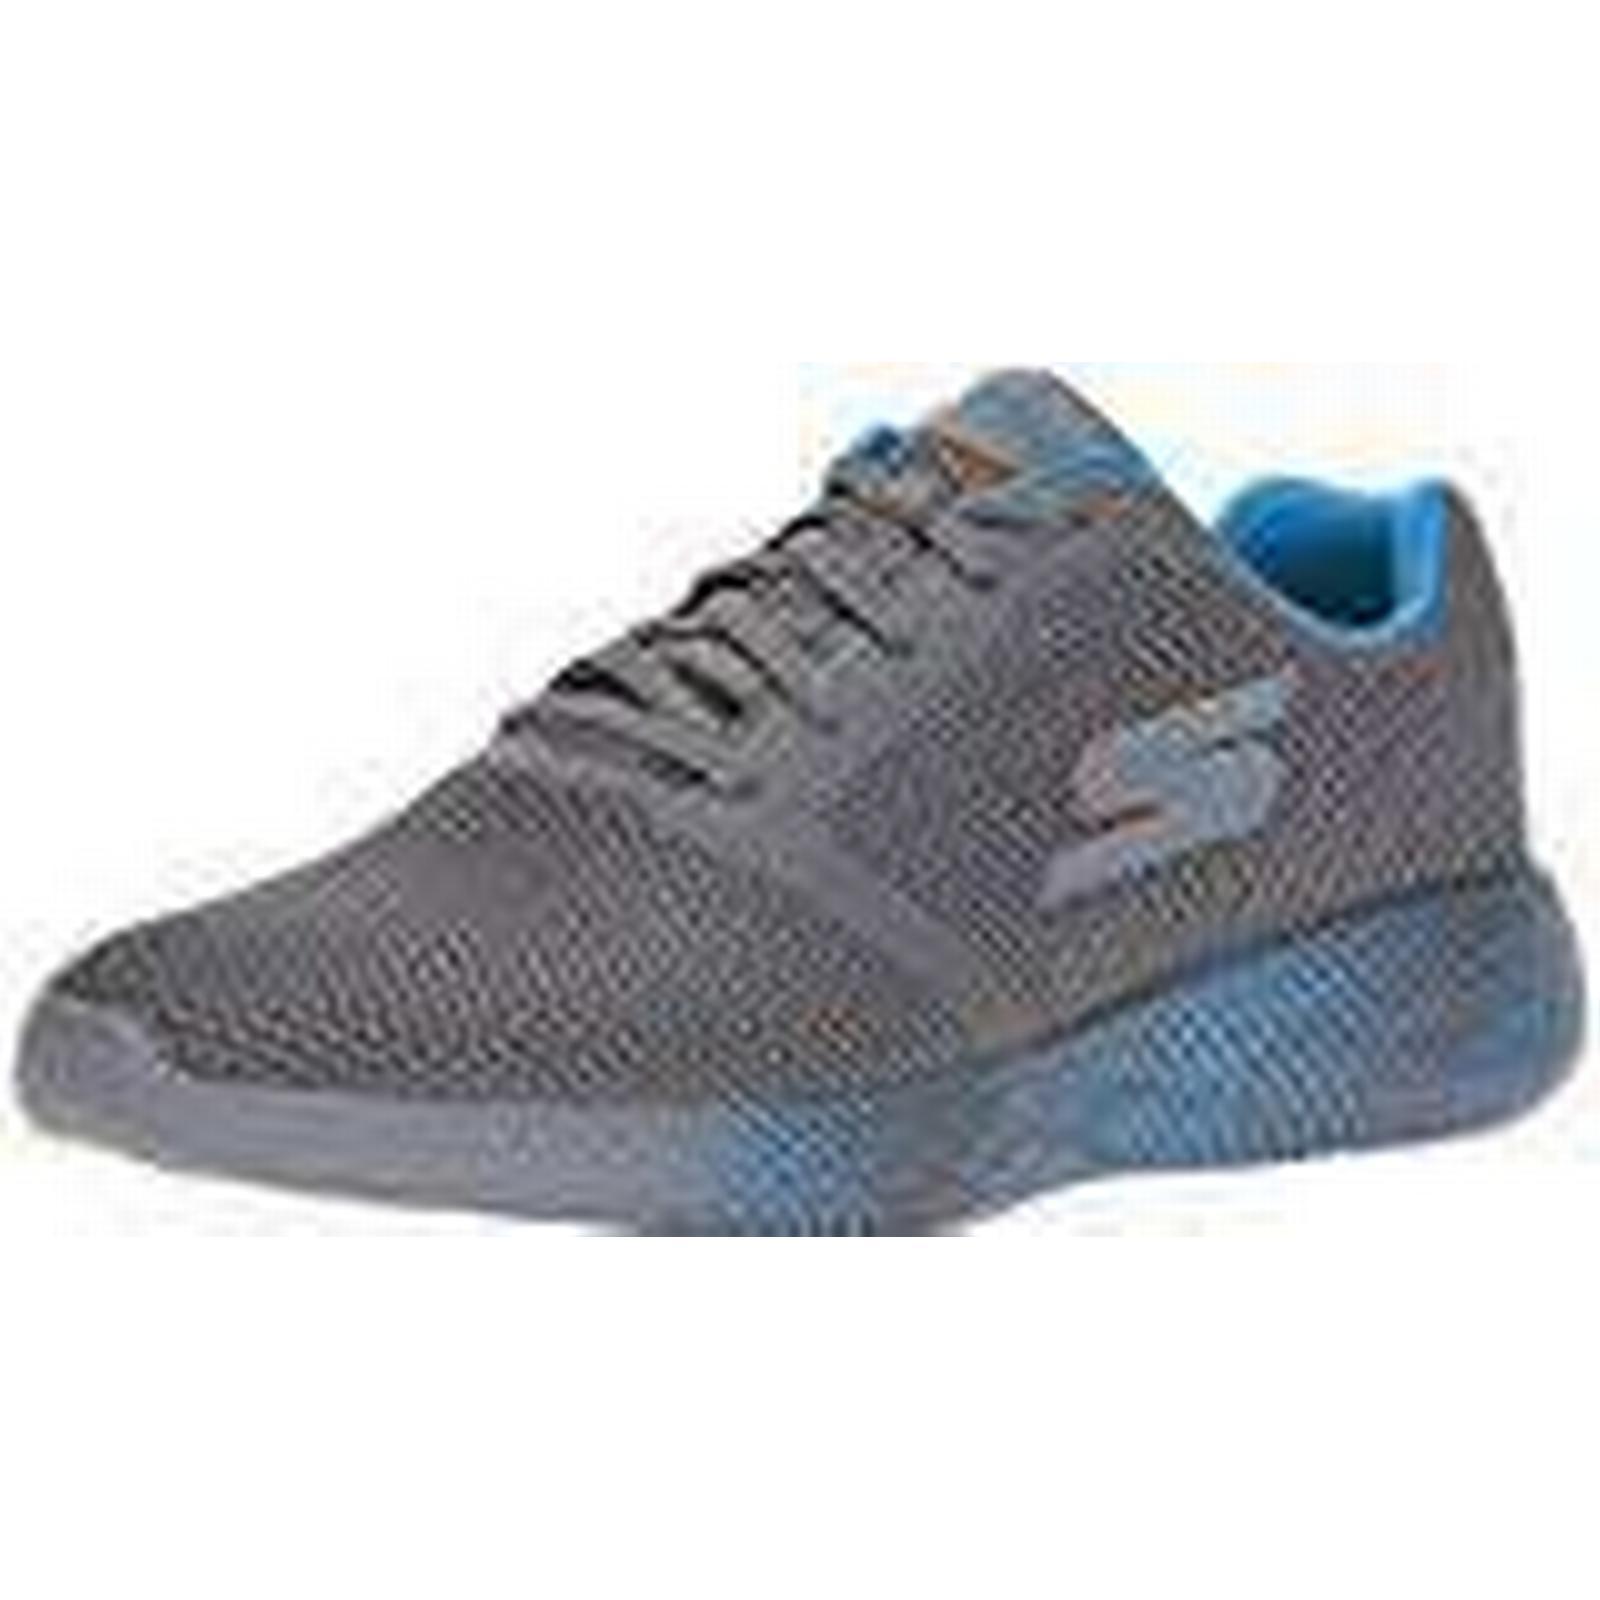 Skechers Men Spectra Go Run 600 - Spectra Men Fitness Shoes Grey (CHARCOAL/Blue) 11 UK 45.5 EU a62d03